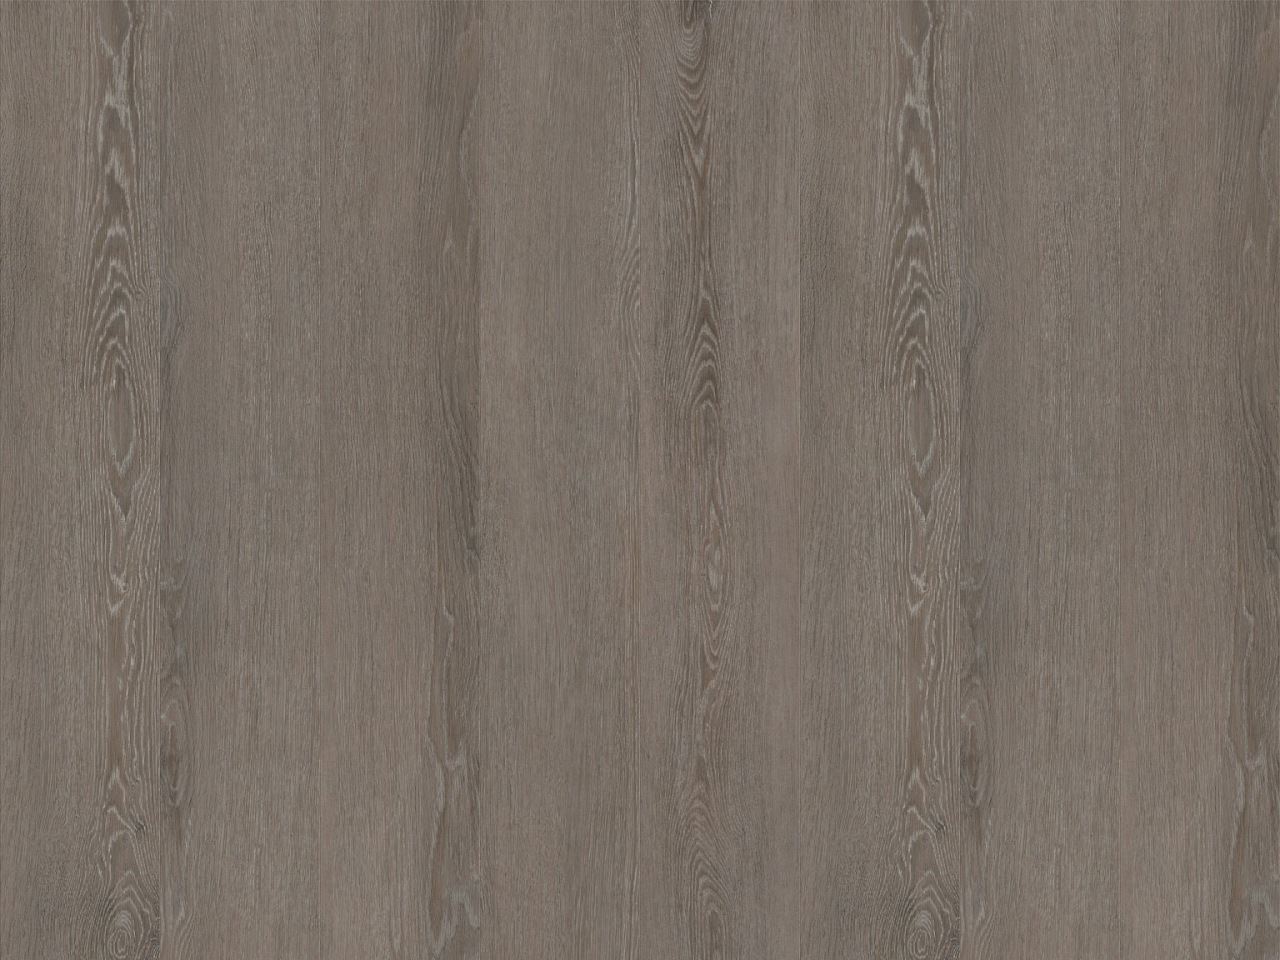 Designbelag Rico wood – Eiche Venlo, 328001